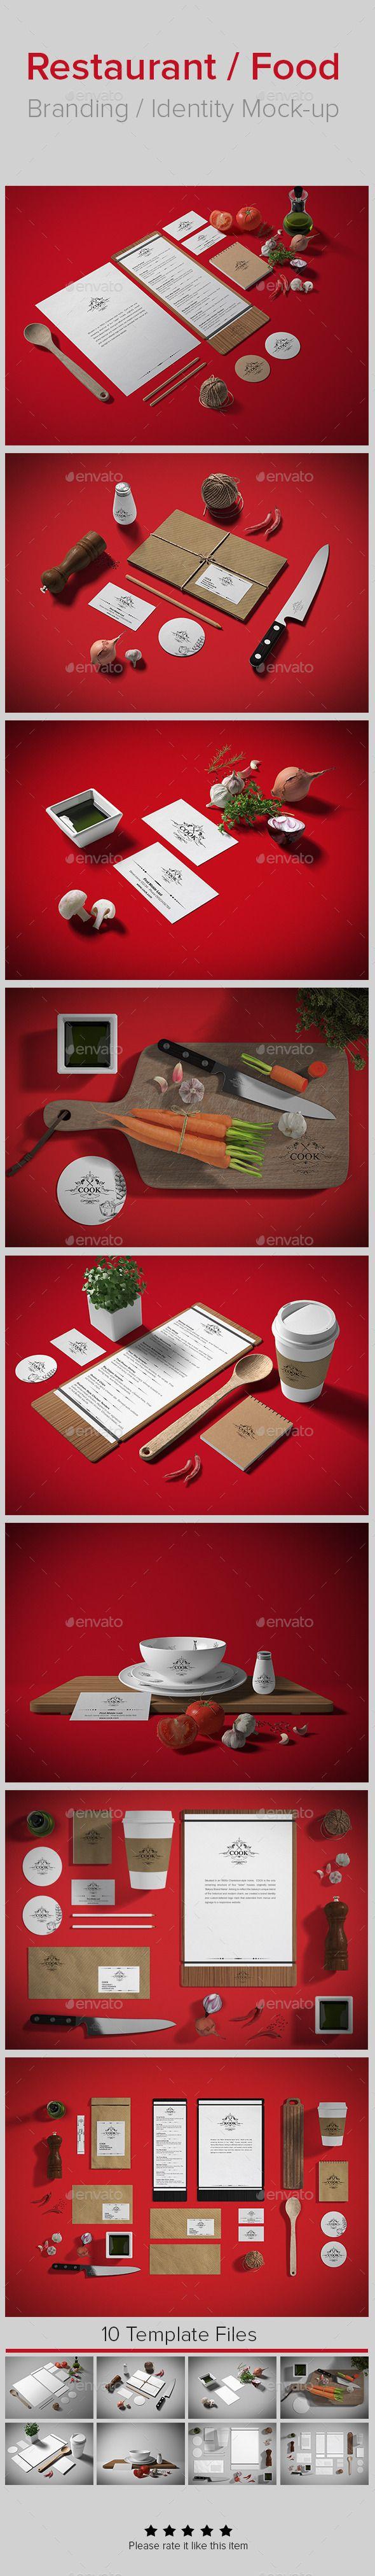 Restaurant / Food Branding Identity Mock-up (Stationery) Restaurant 20 20Food 20Preview